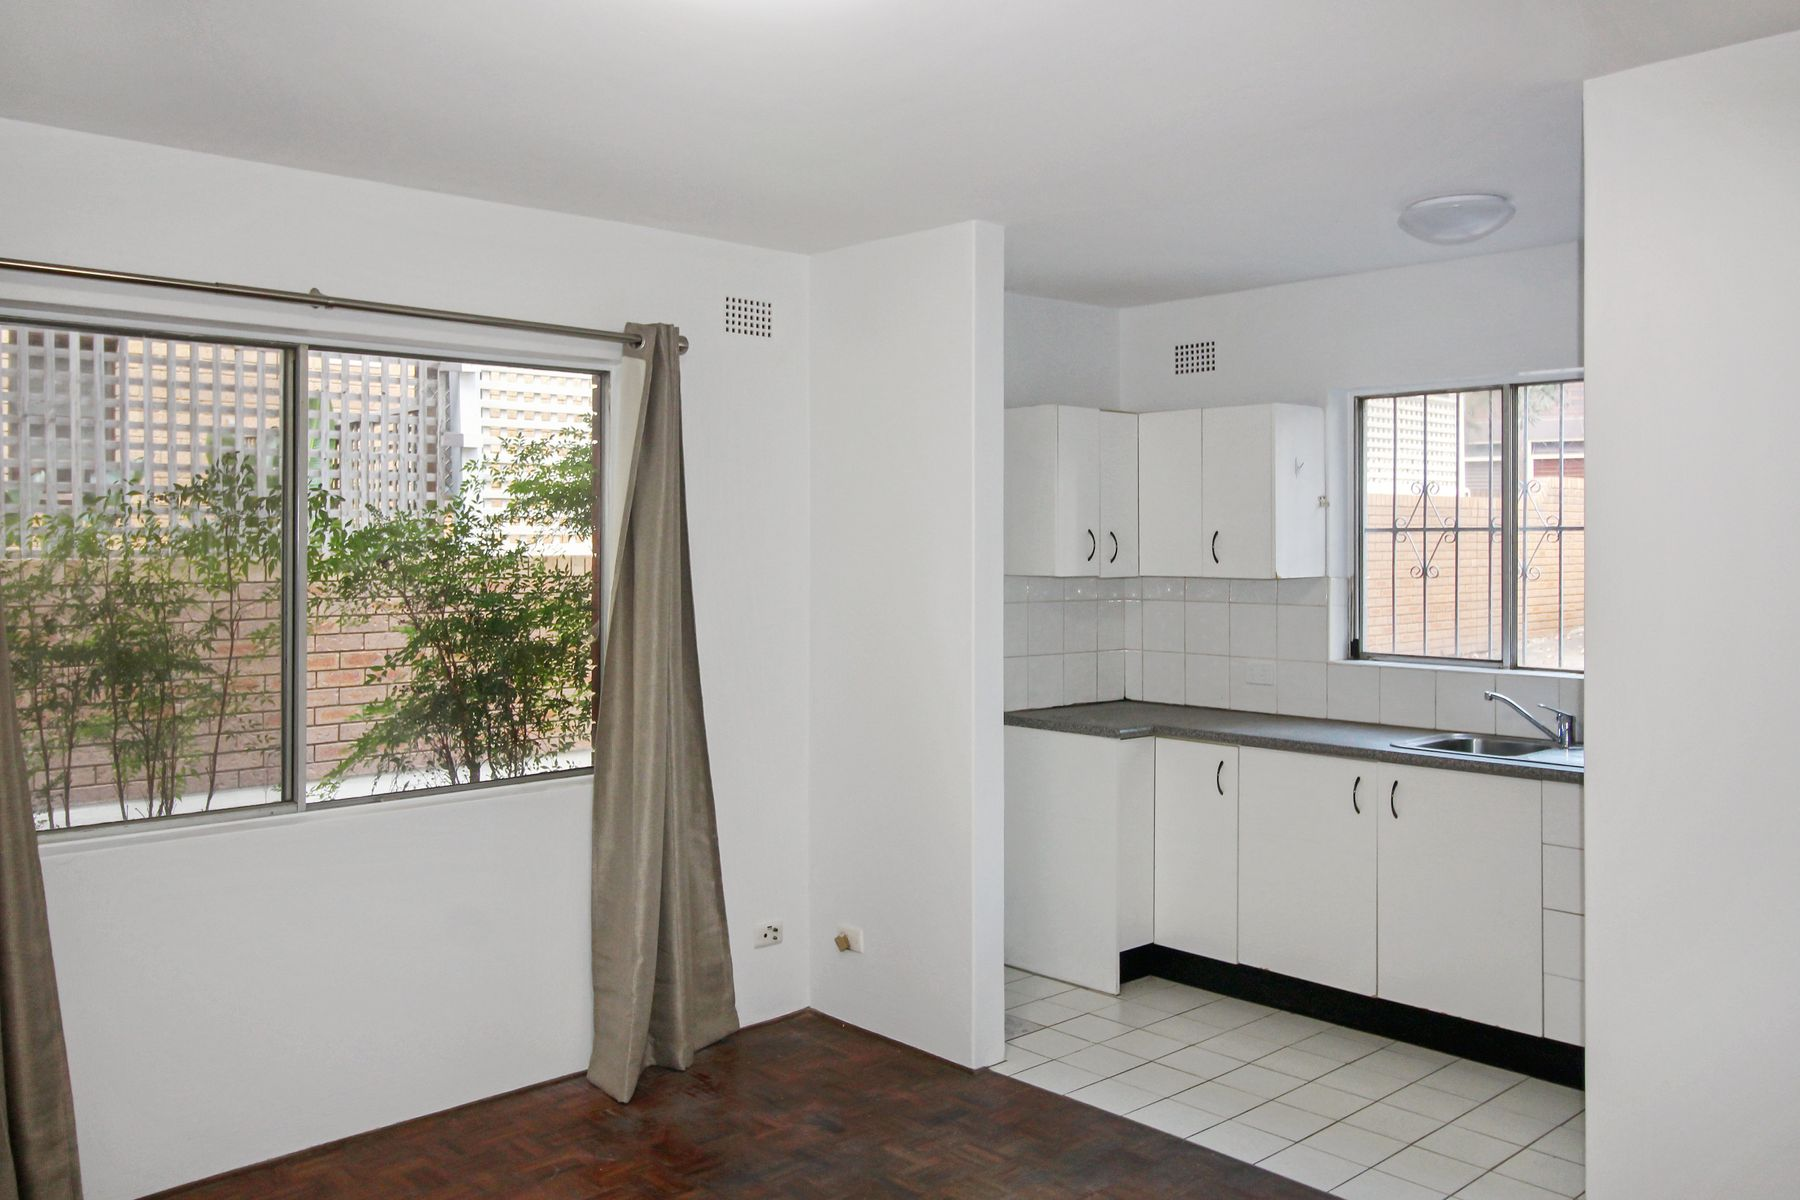 2/7 Cambridge Street, Gladesville, NSW 2111